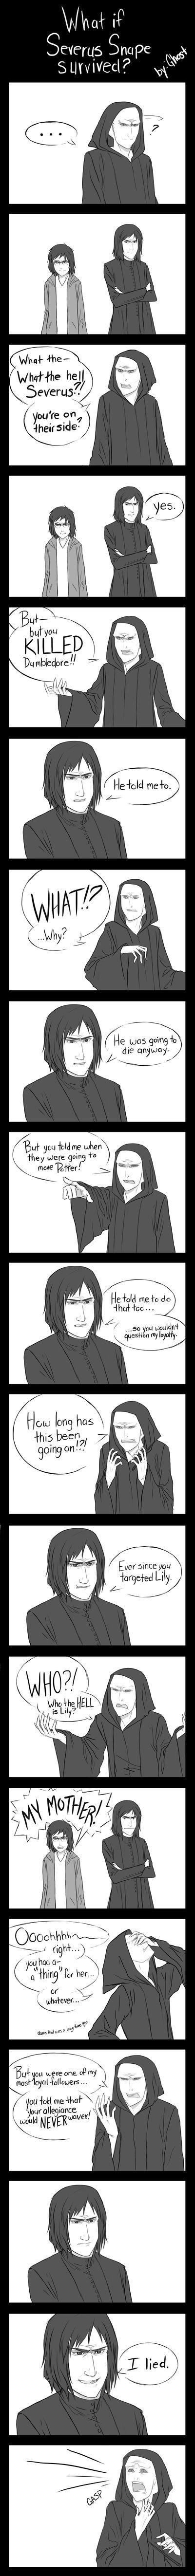 I chuckled. [via MuggleNet]